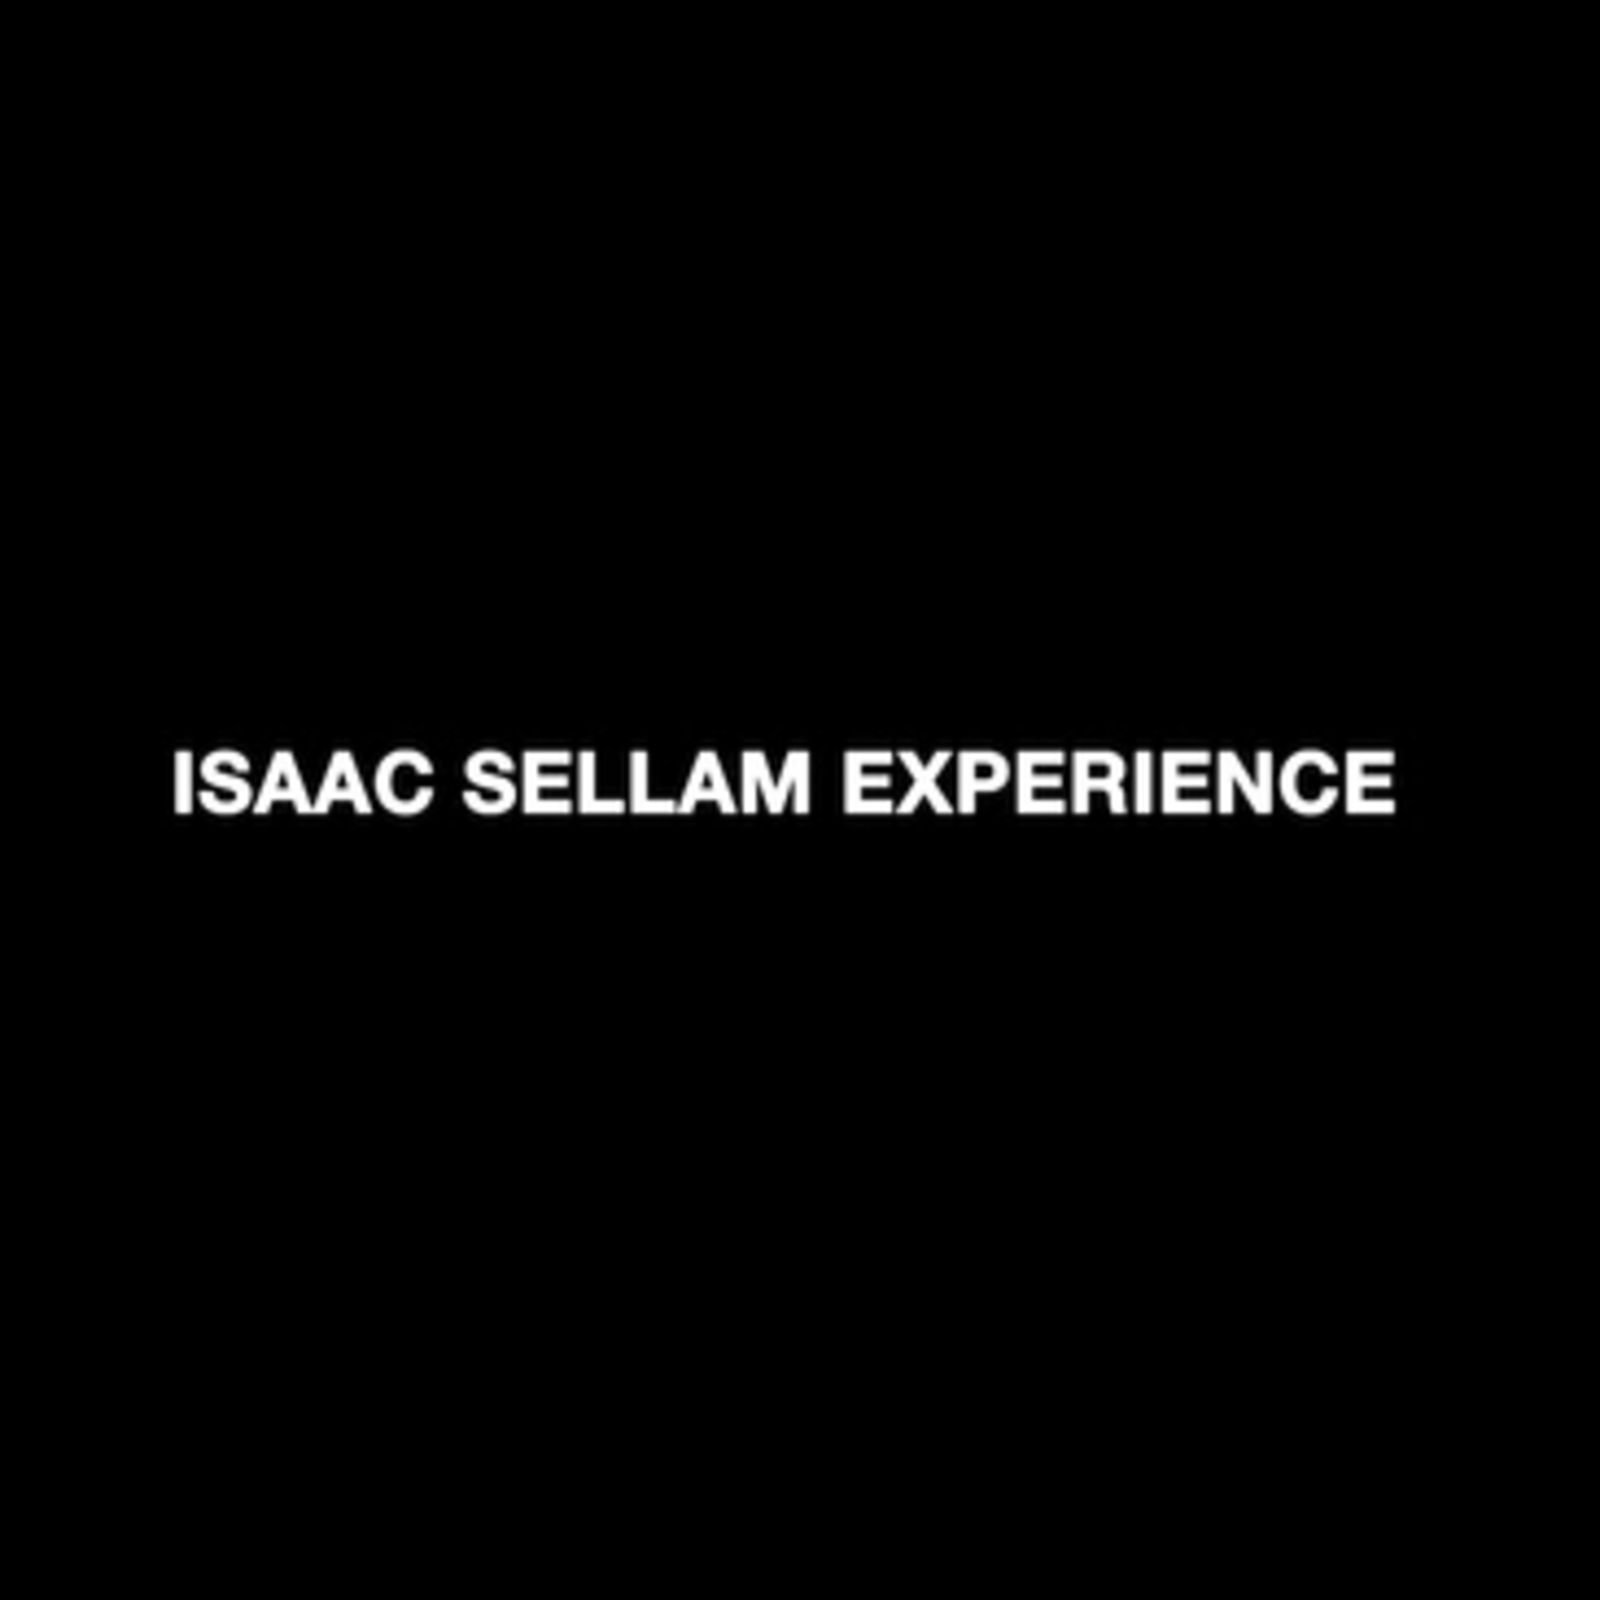 ISAAC SELLAM Experience